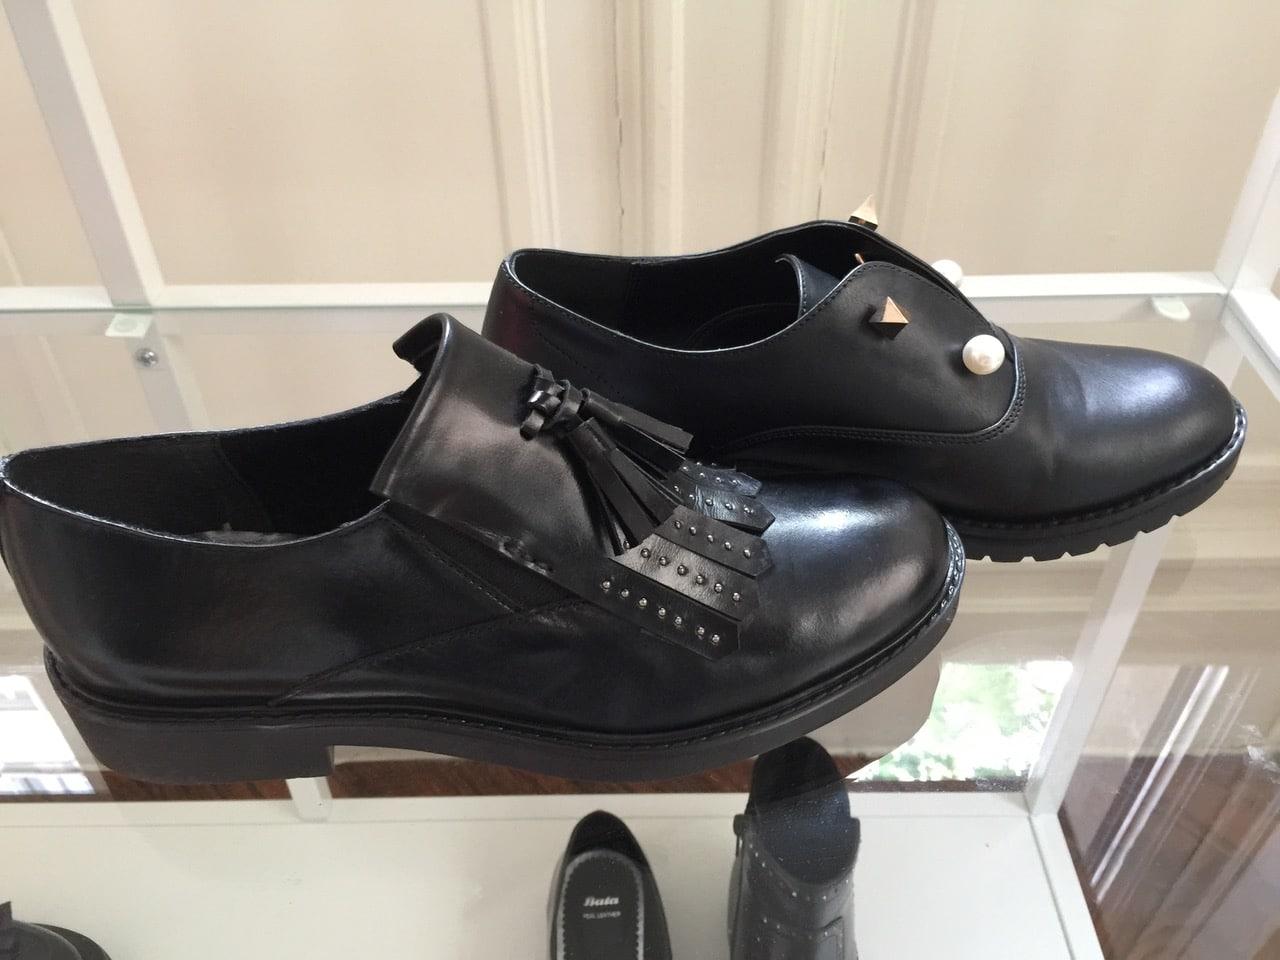 Bata scarpe donna invernali 2018-2019